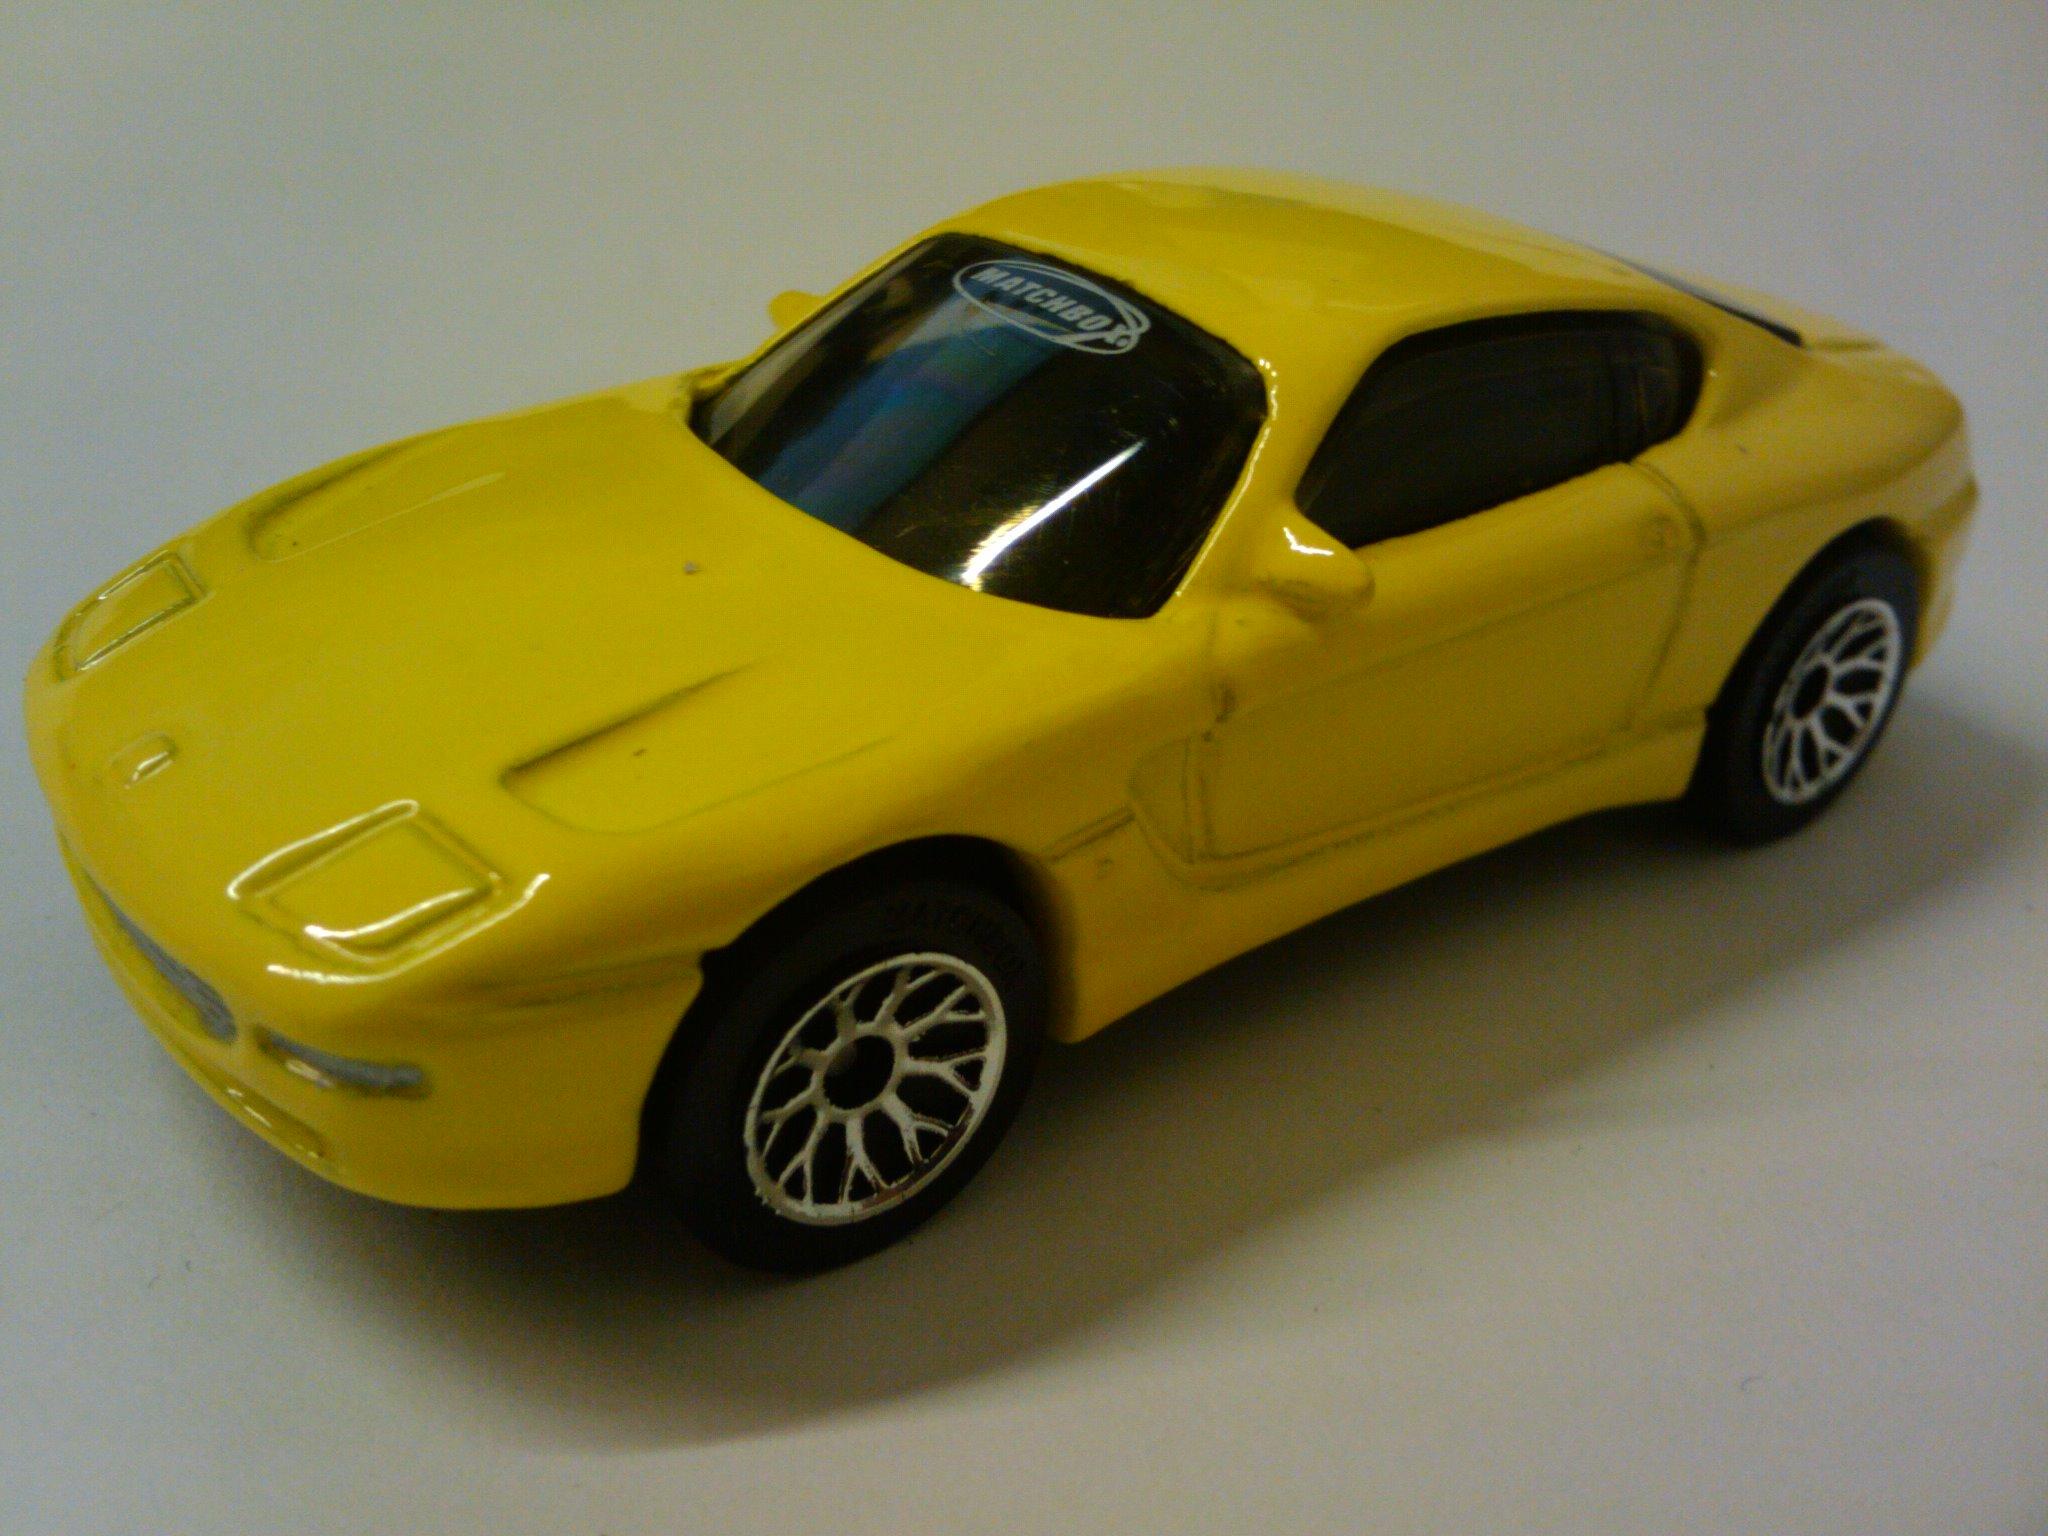 Ferrari 456 GT - Matchbox Cars Wiki